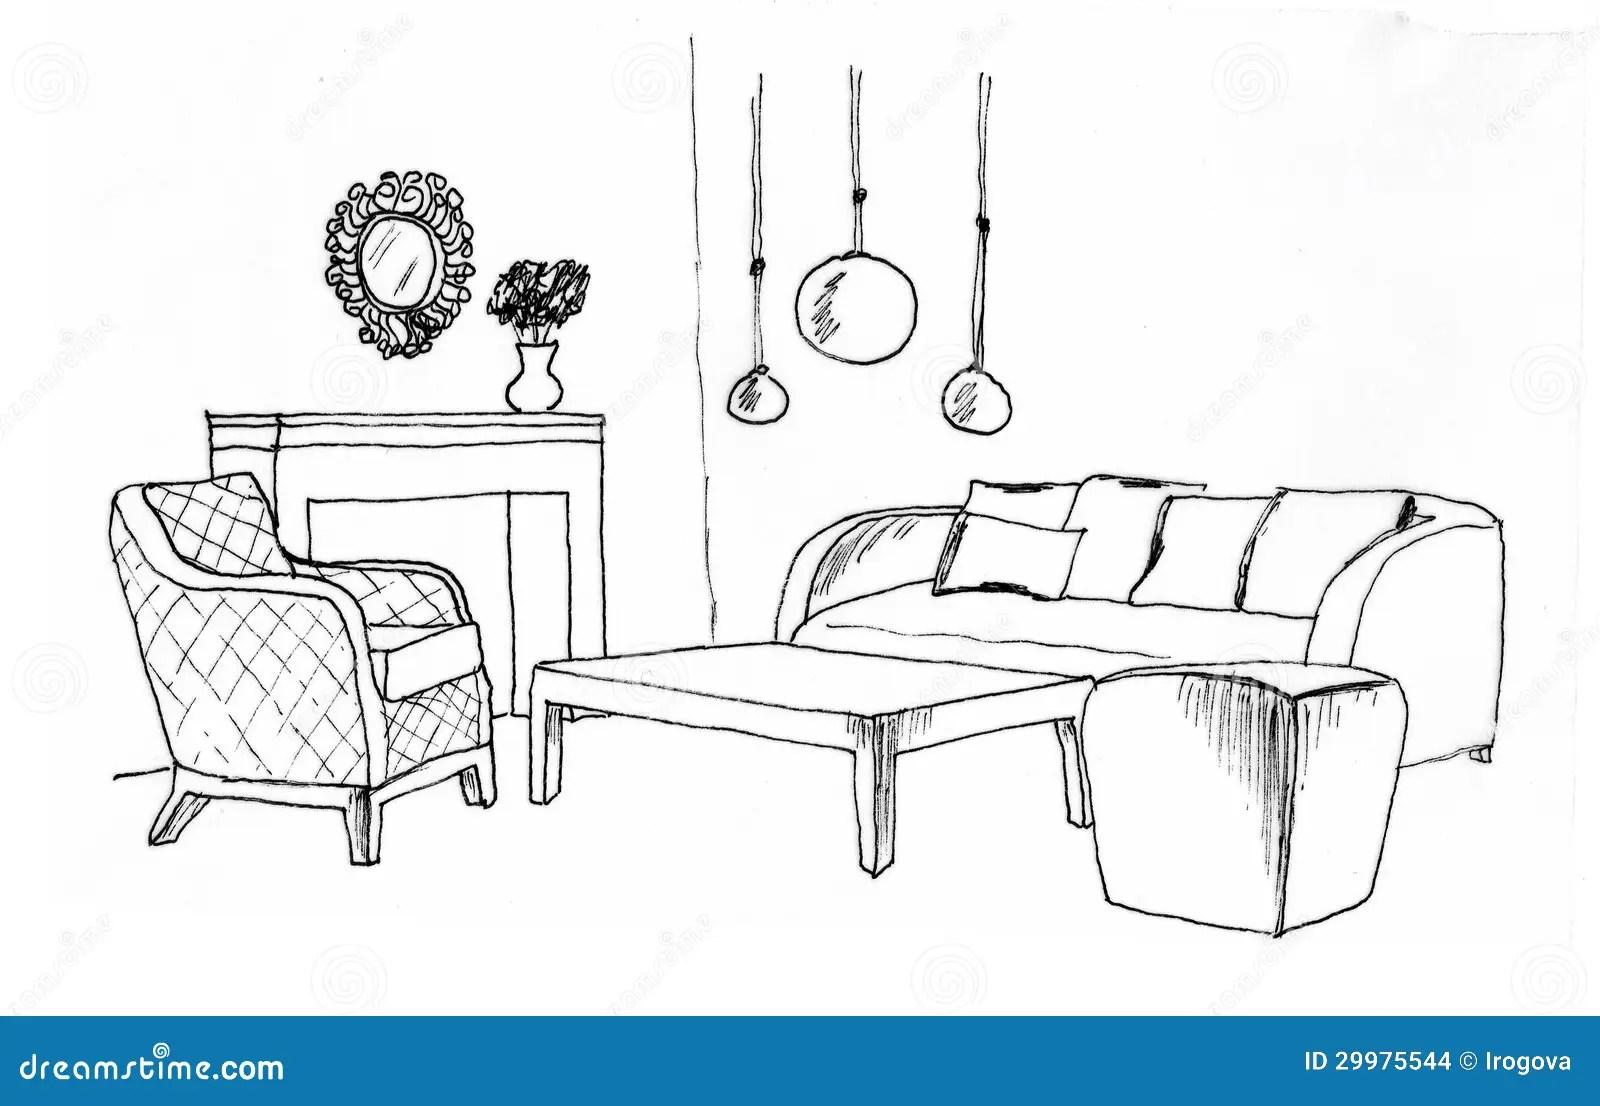 Amazon Sofa Bed